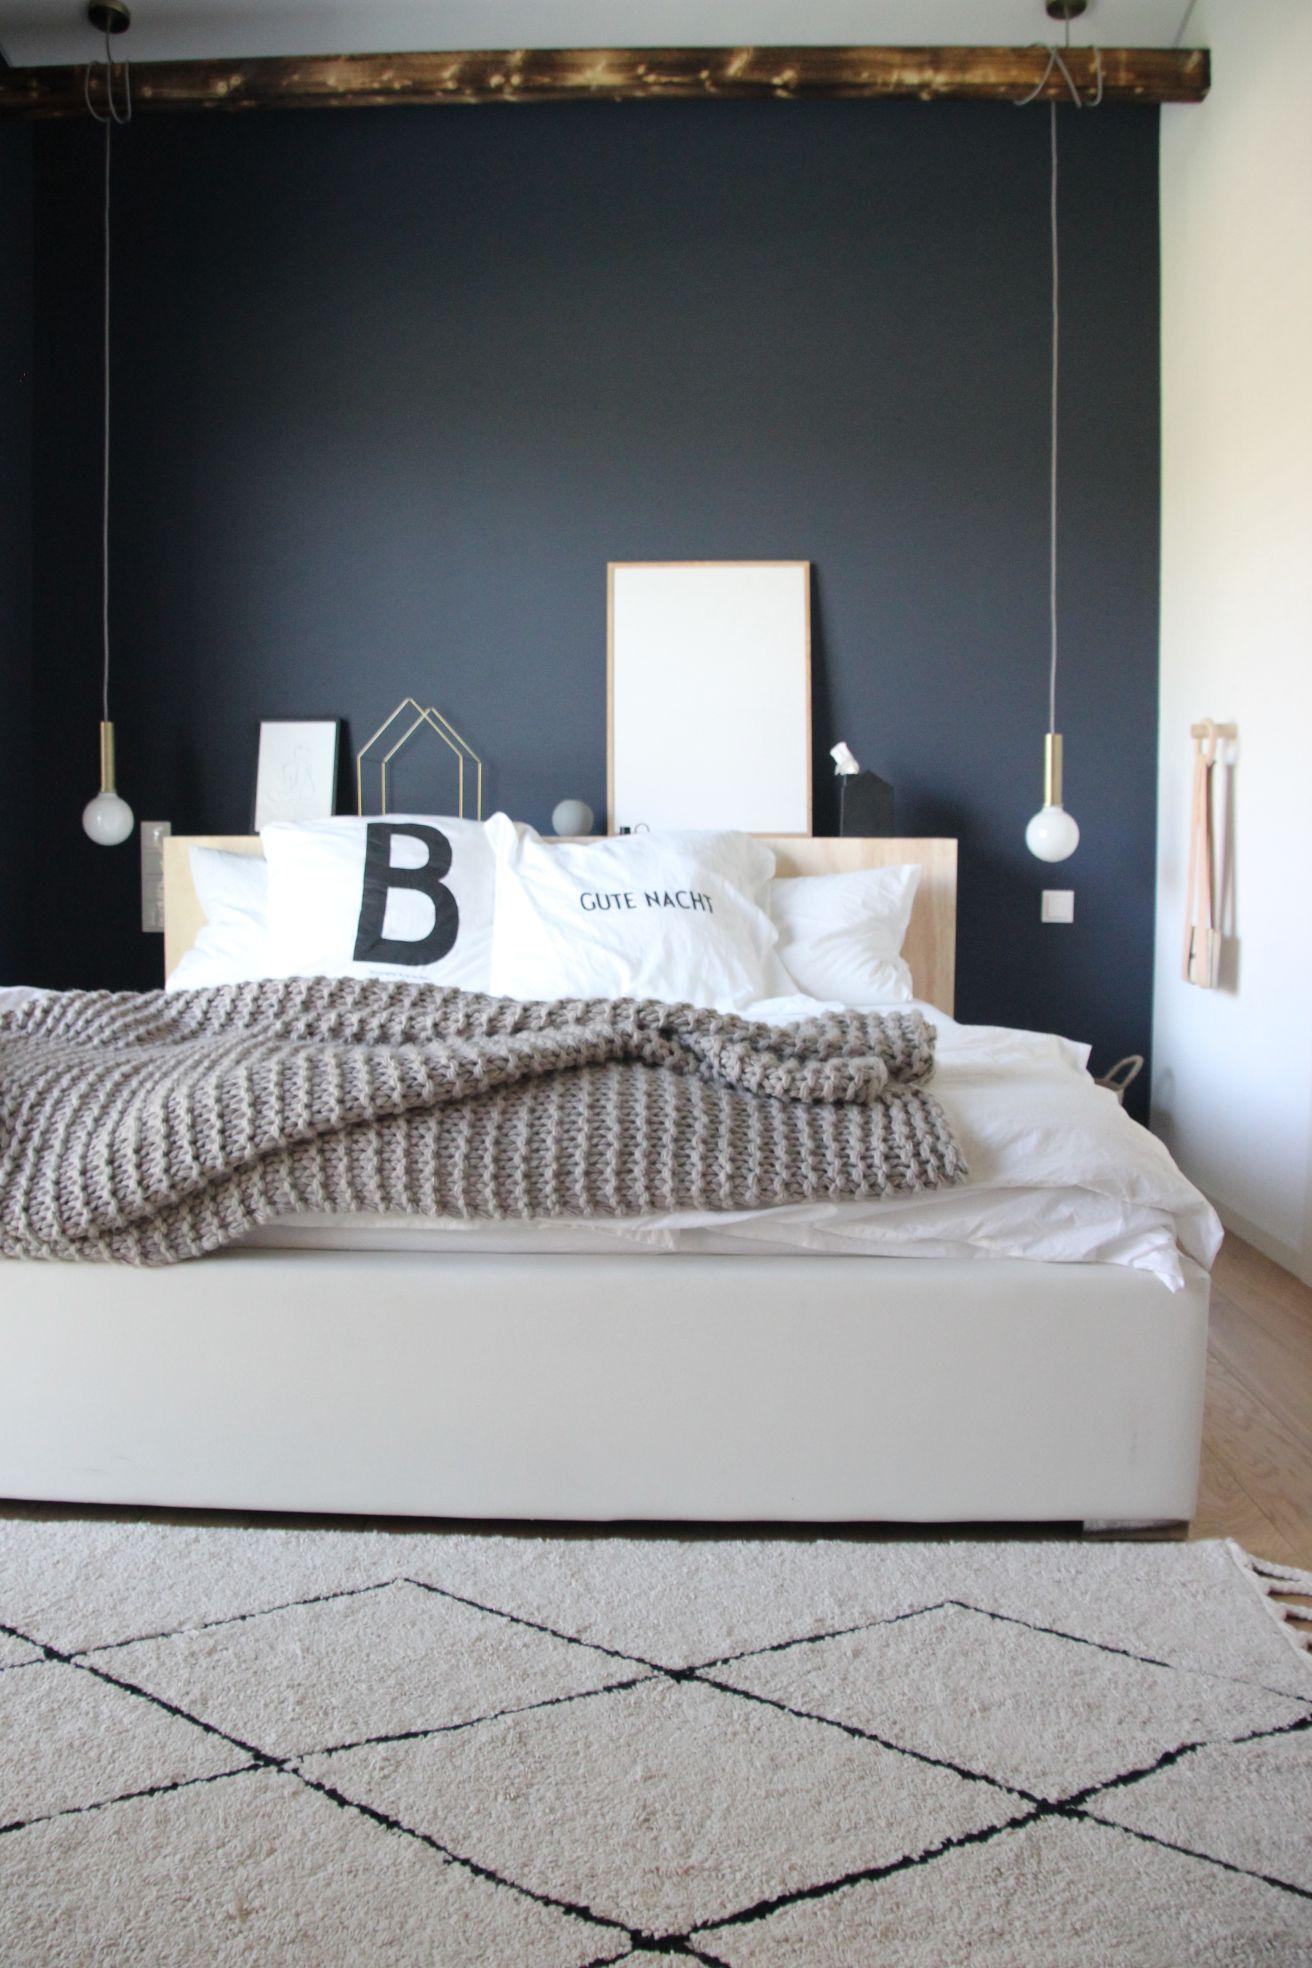 Schlafzimmer Makeover Architects Finest Schoner Wohnen Farbe Schoner Wohnen Schlafzimmer Schoner Wohnen Farbe Schlafzimmer Neu Gestalten